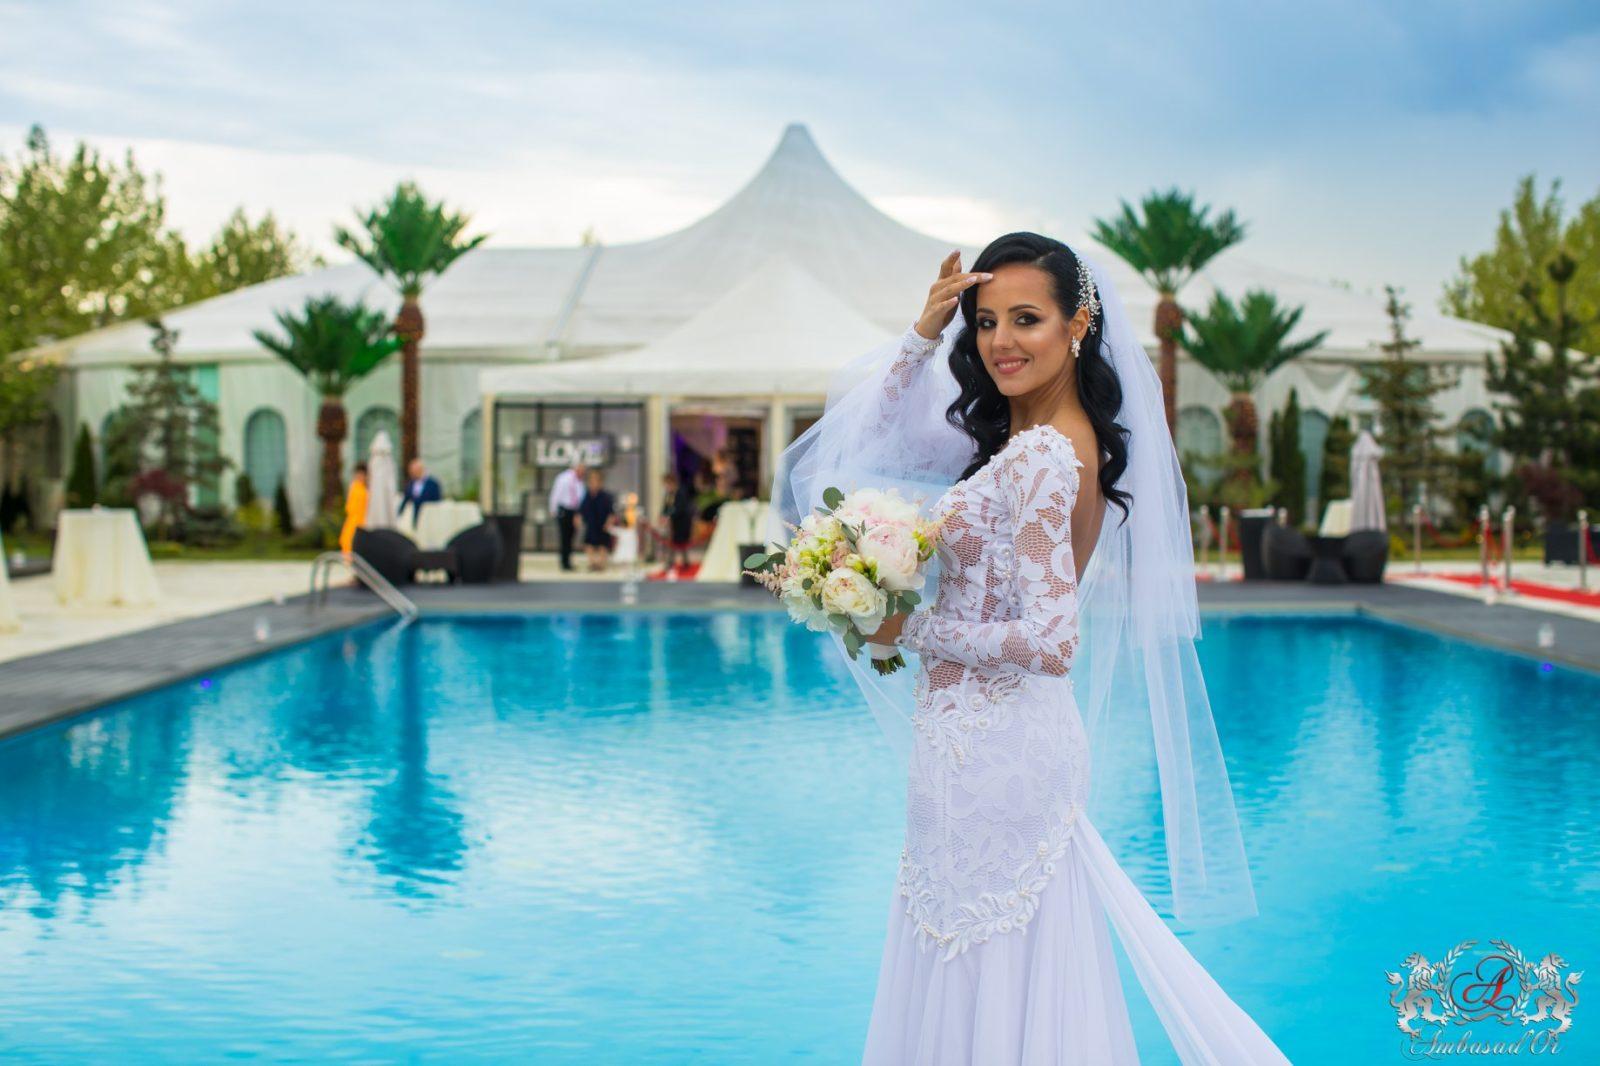 Nunta perfecta – cort sau restaurant?